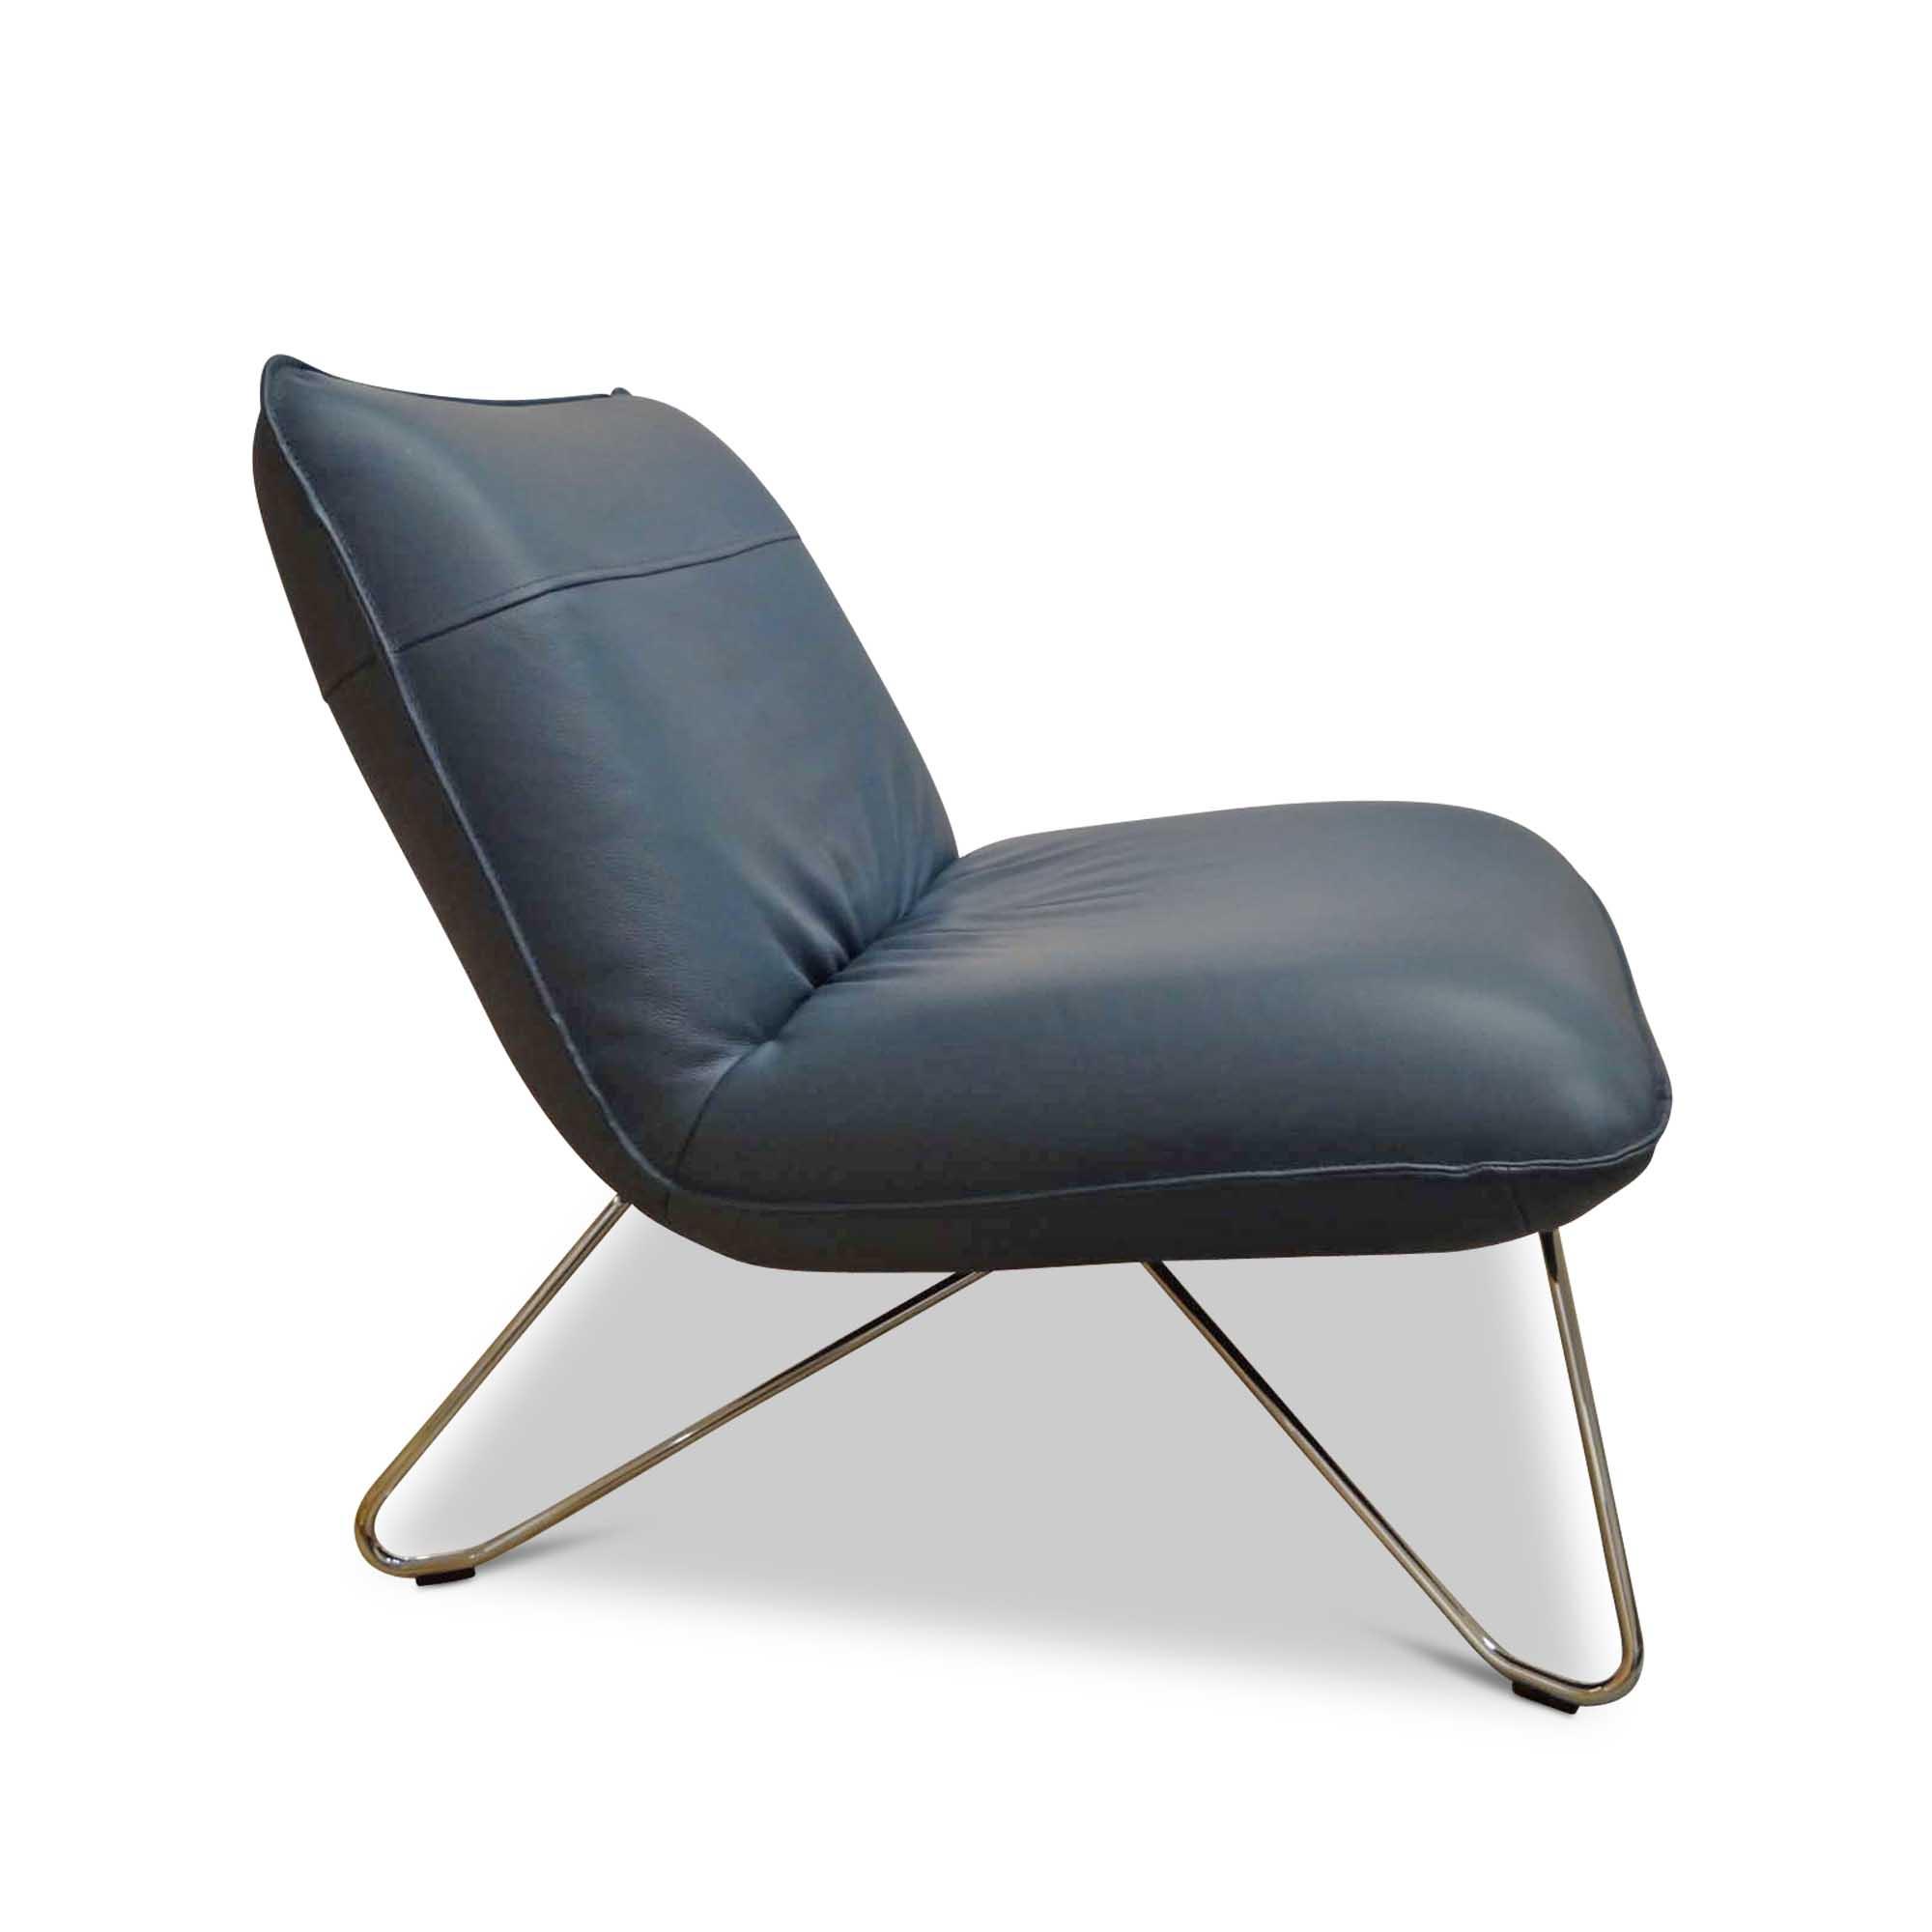 Rolf Benz Designer Sessel 394 Leder Metall Grau Chrom Petrol Ebay